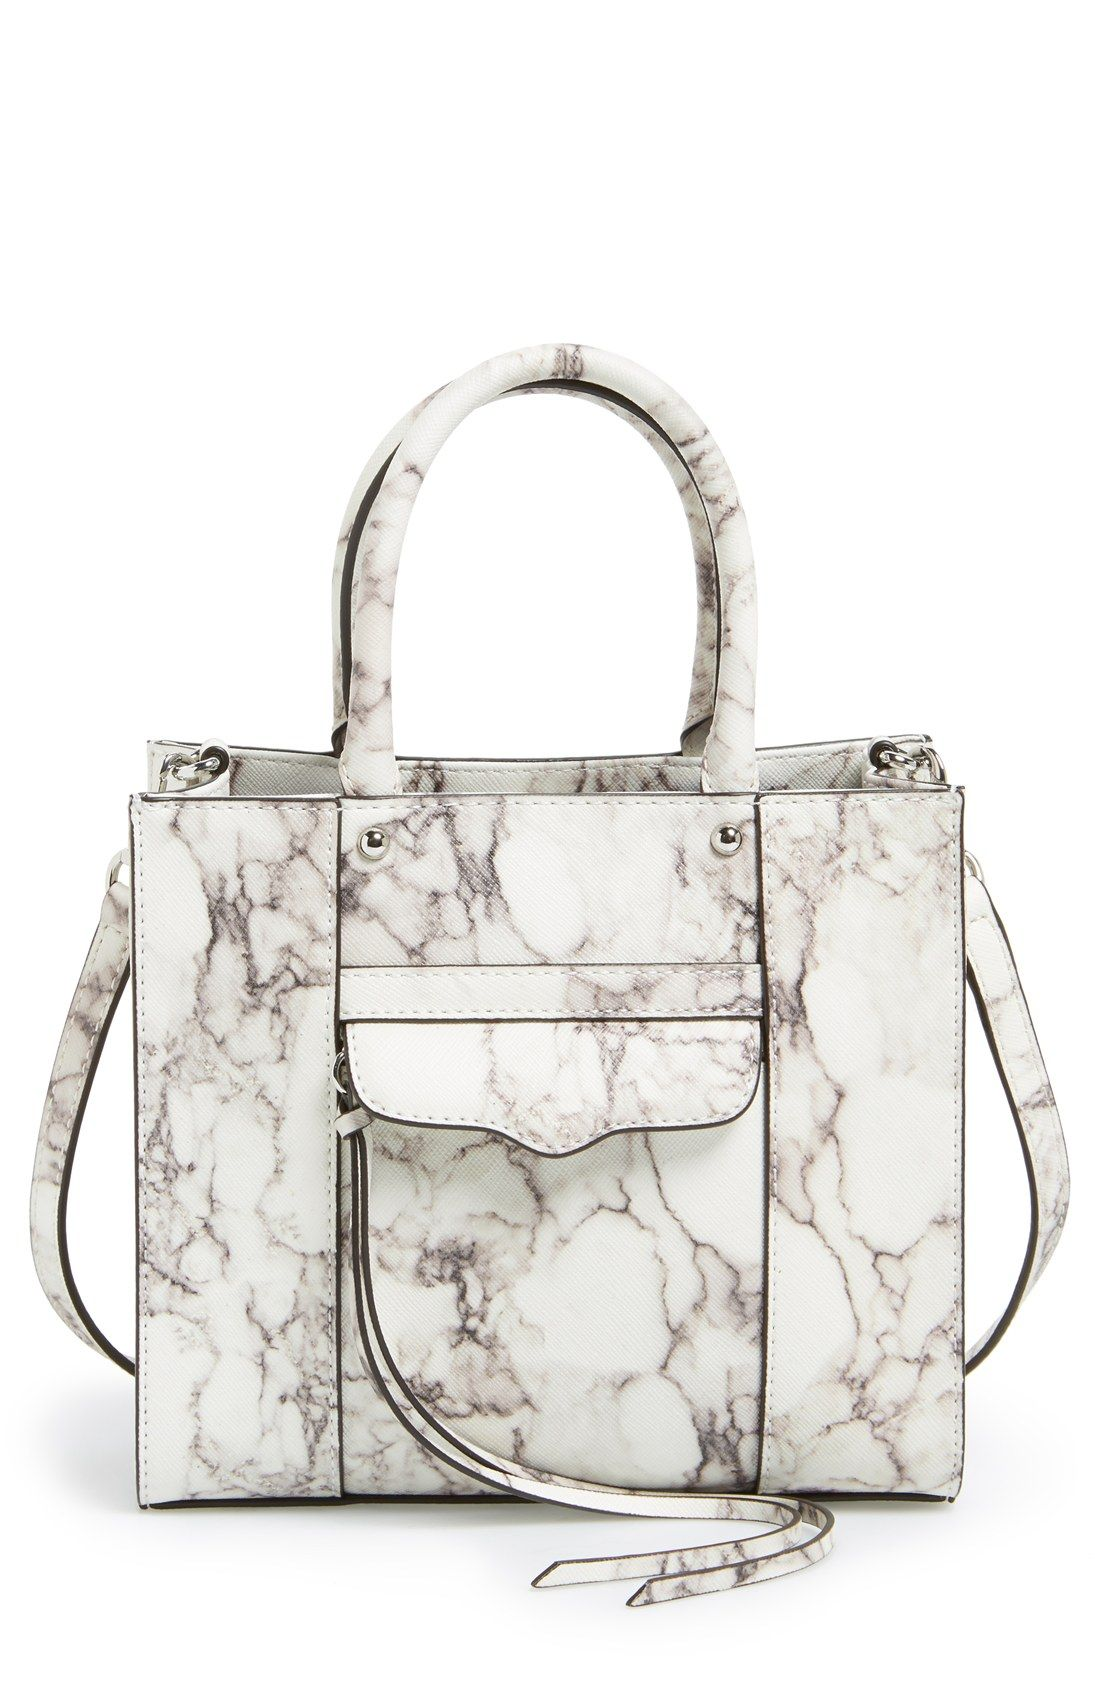 5e534777f5 ... Bags for Women. Marble print satchel  chic structured handbag    Rebecca  Minkoff